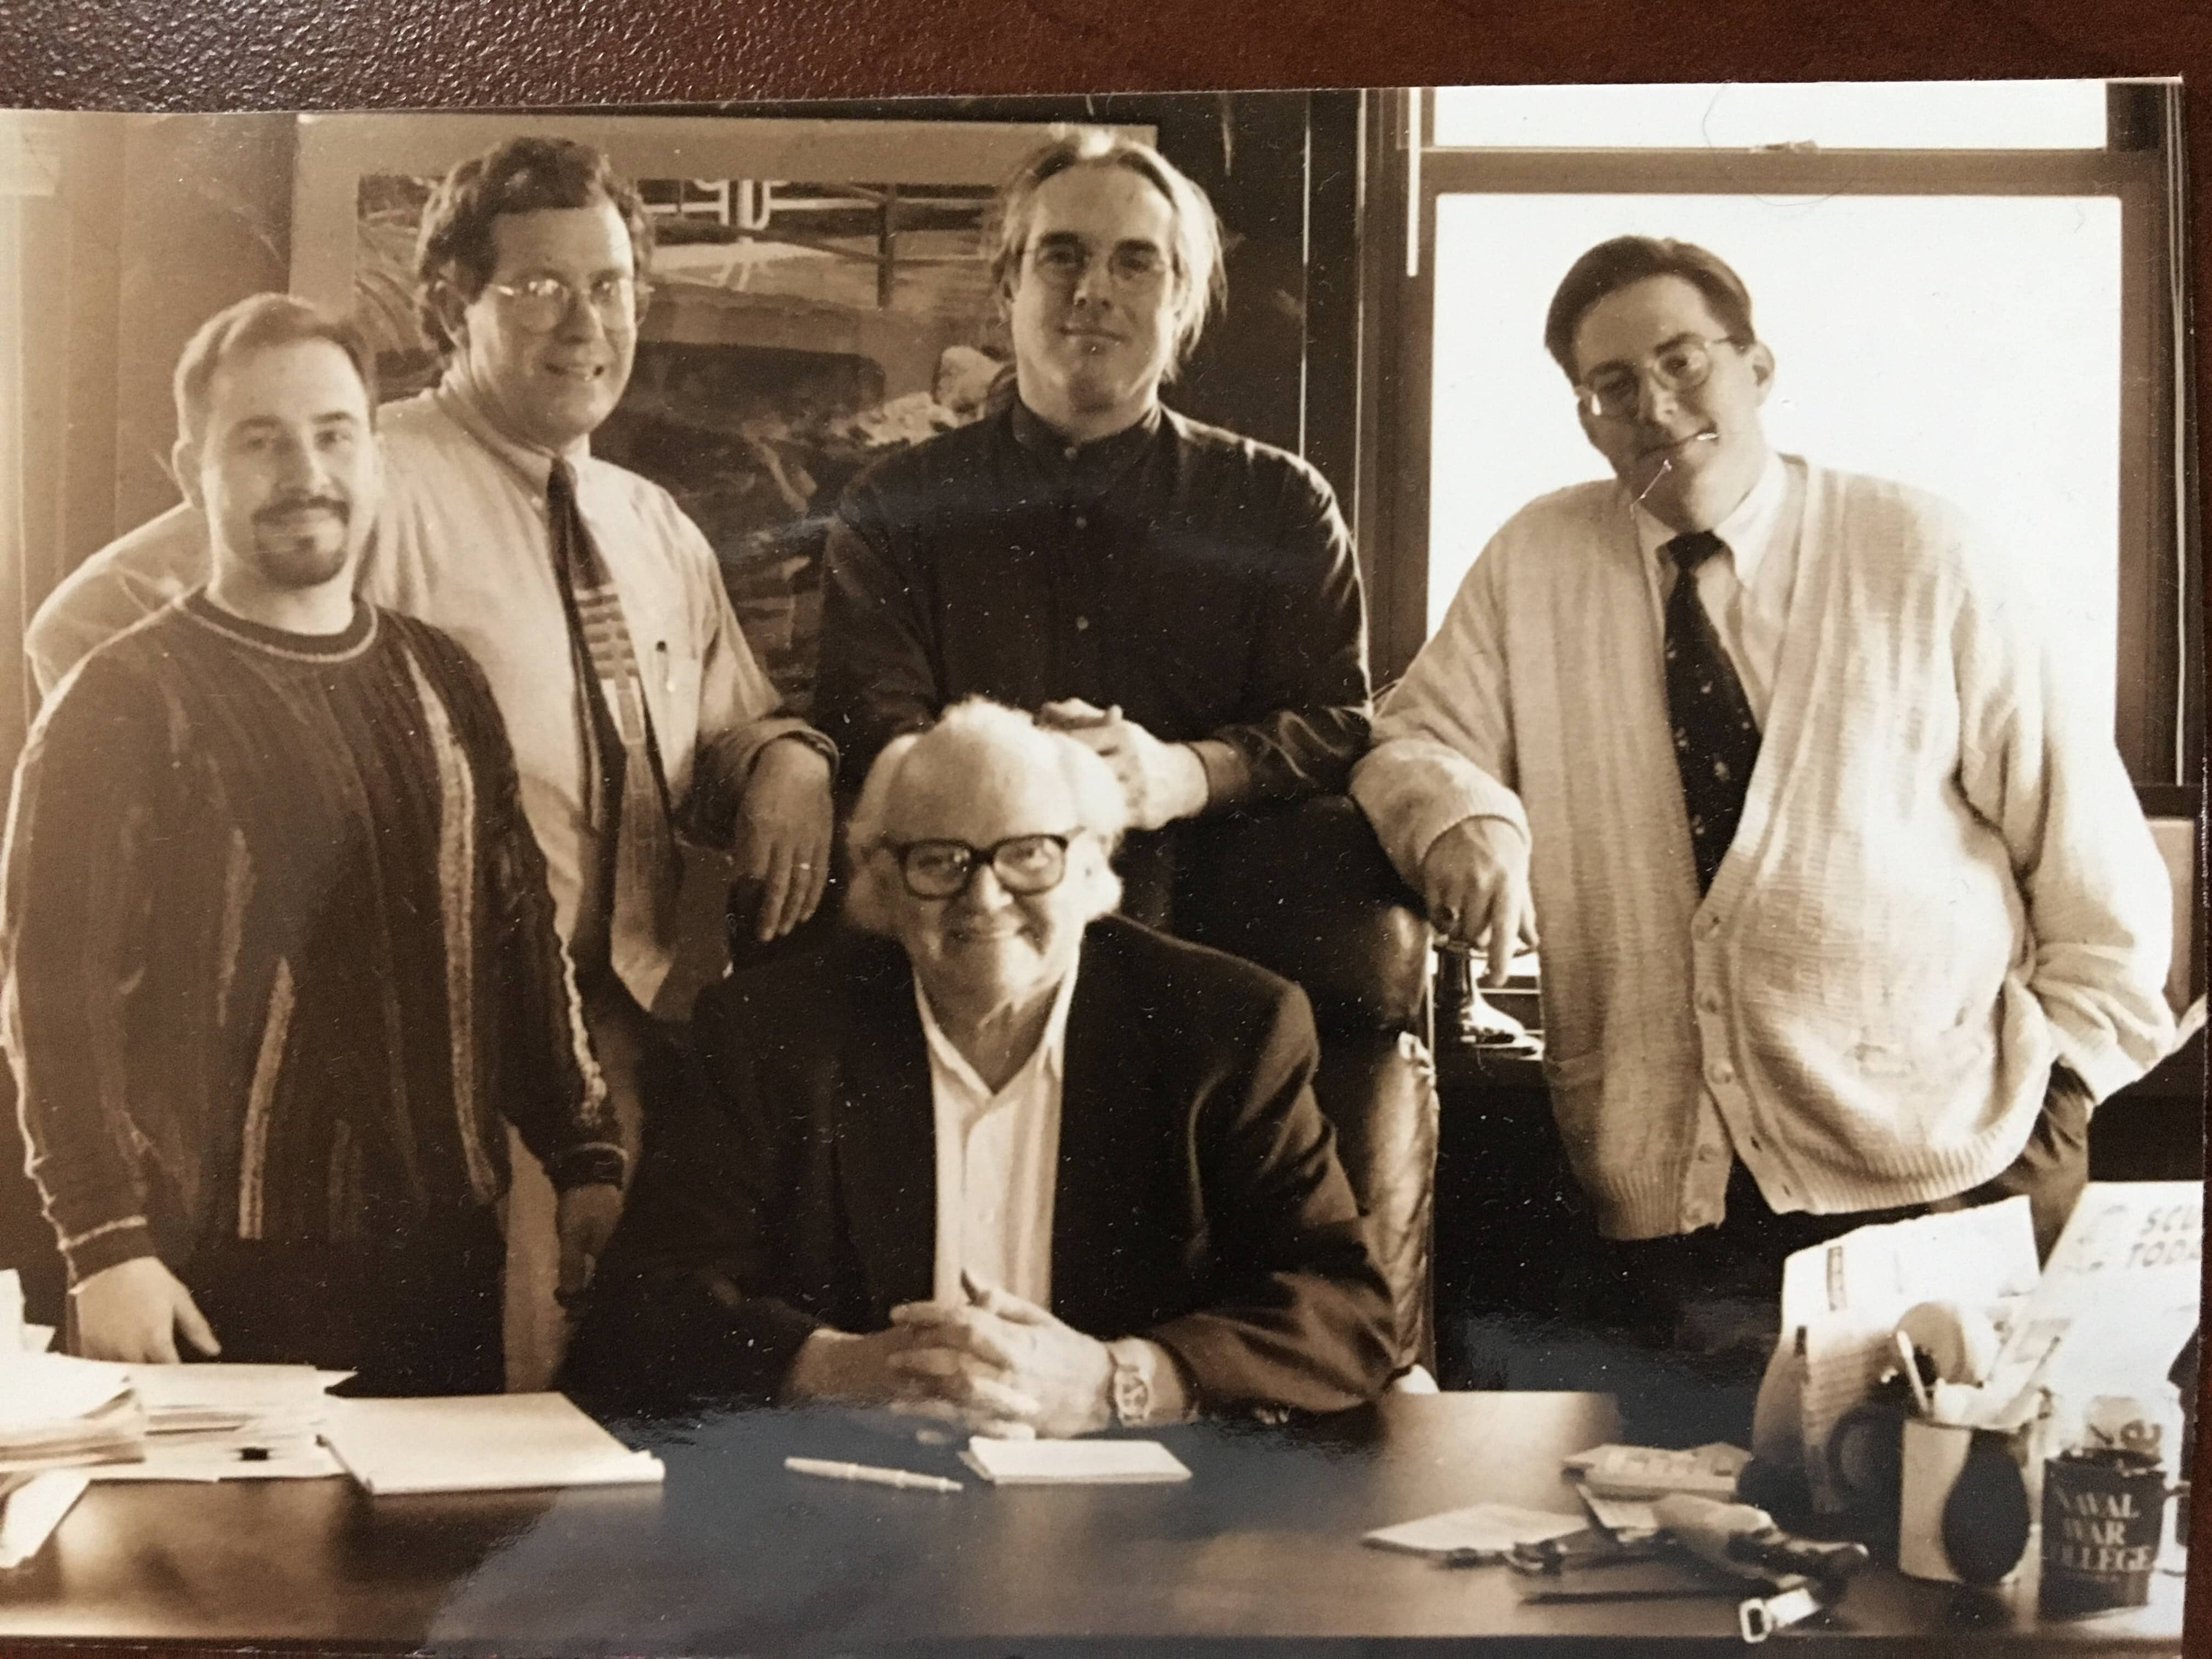 Mark Aiello, Tim Esper, Jon Garrett, John Maksym and seated Steve Sweeney